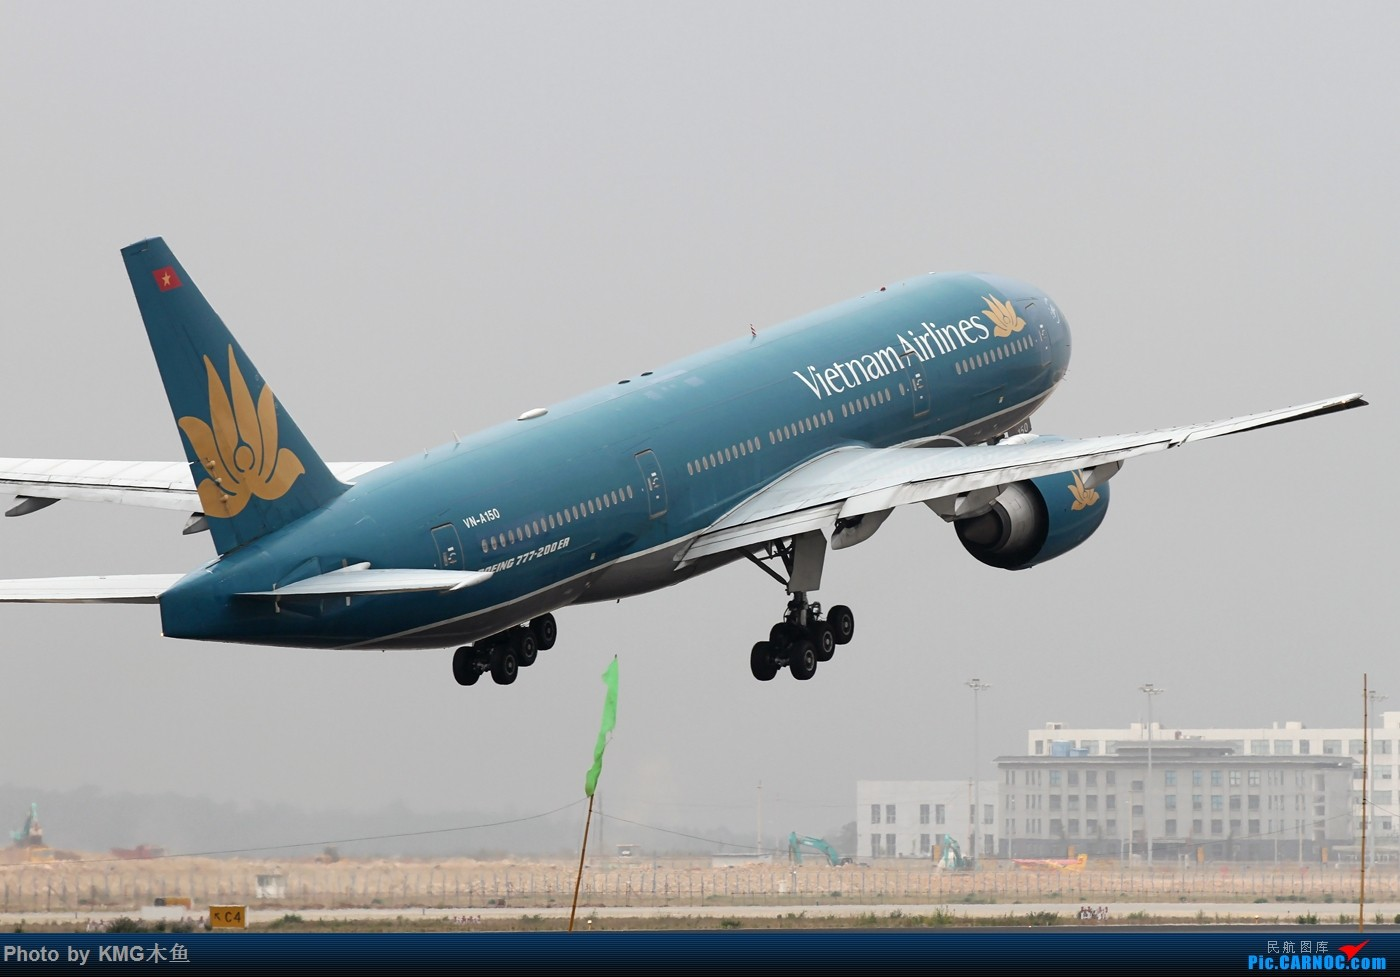 Re:[原创]【KMG】【昆明长水国际机场】烂天有好货在昆明同样适用 BOEING 777-200 VN-A150 中国昆明长水国际机场机场